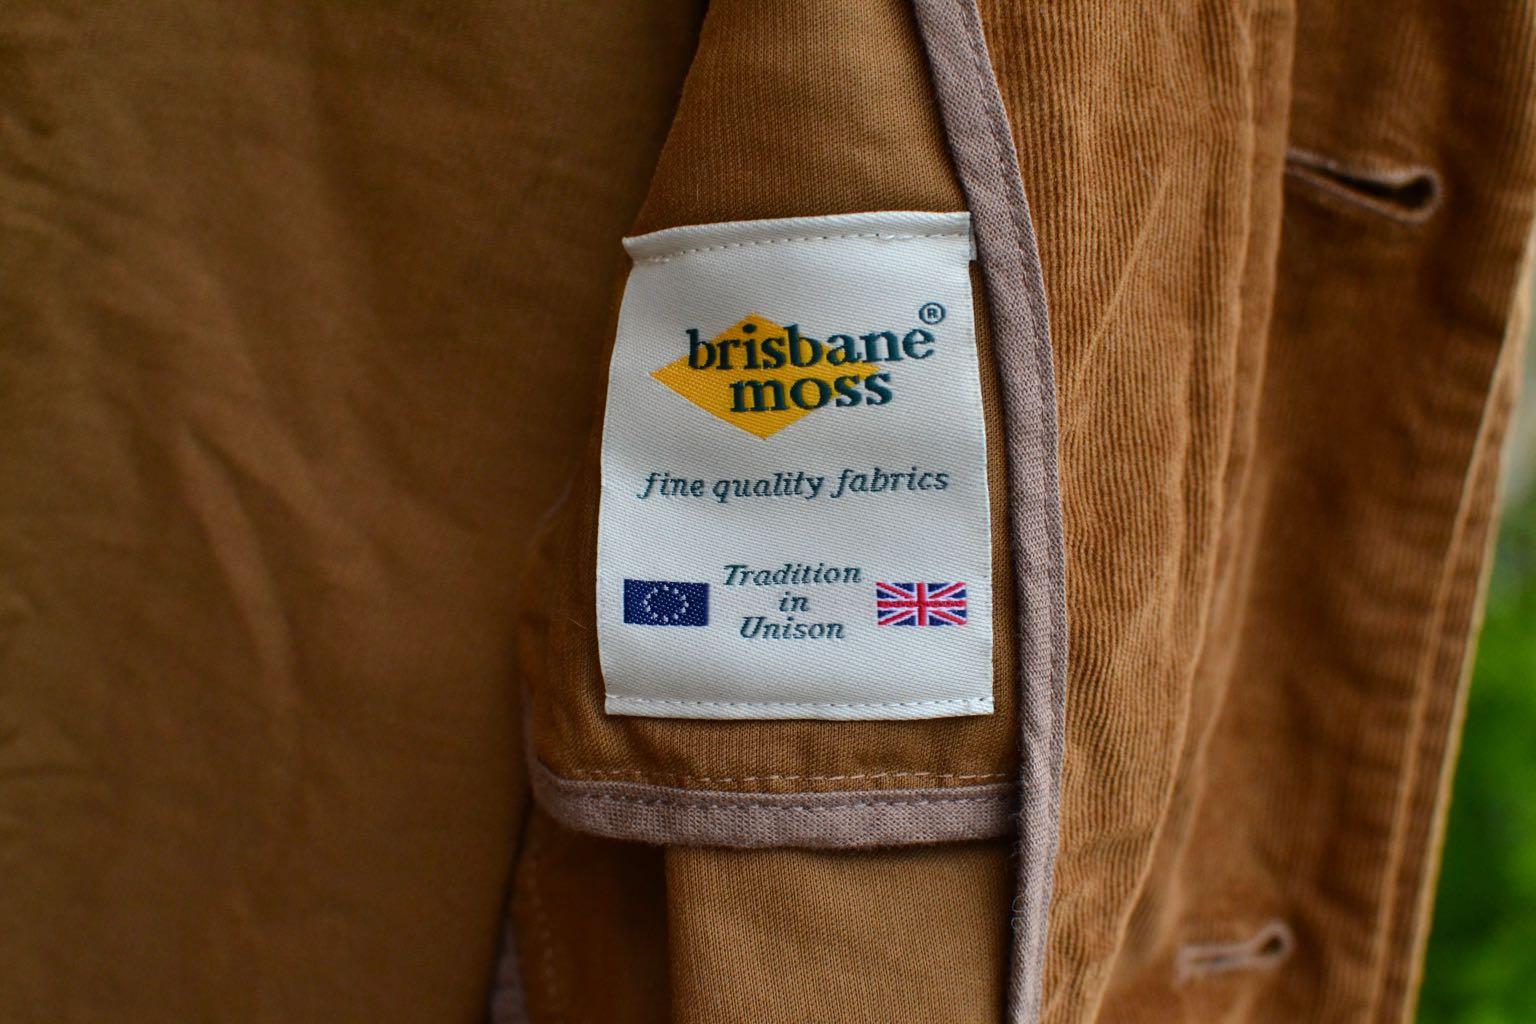 Kestin-hare-Kenmore blazer & Iverness trouser in tobacco Brisbane Moss cord